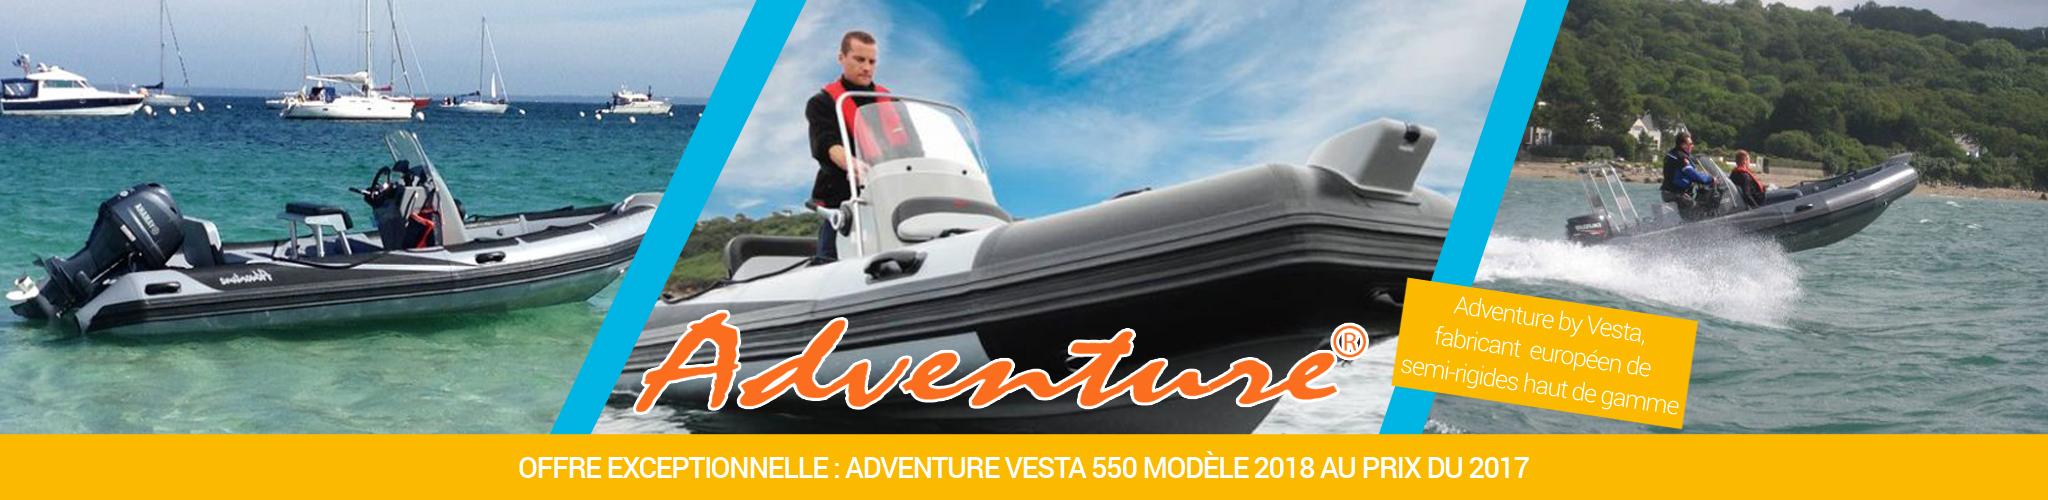 Adventure 550 vesta